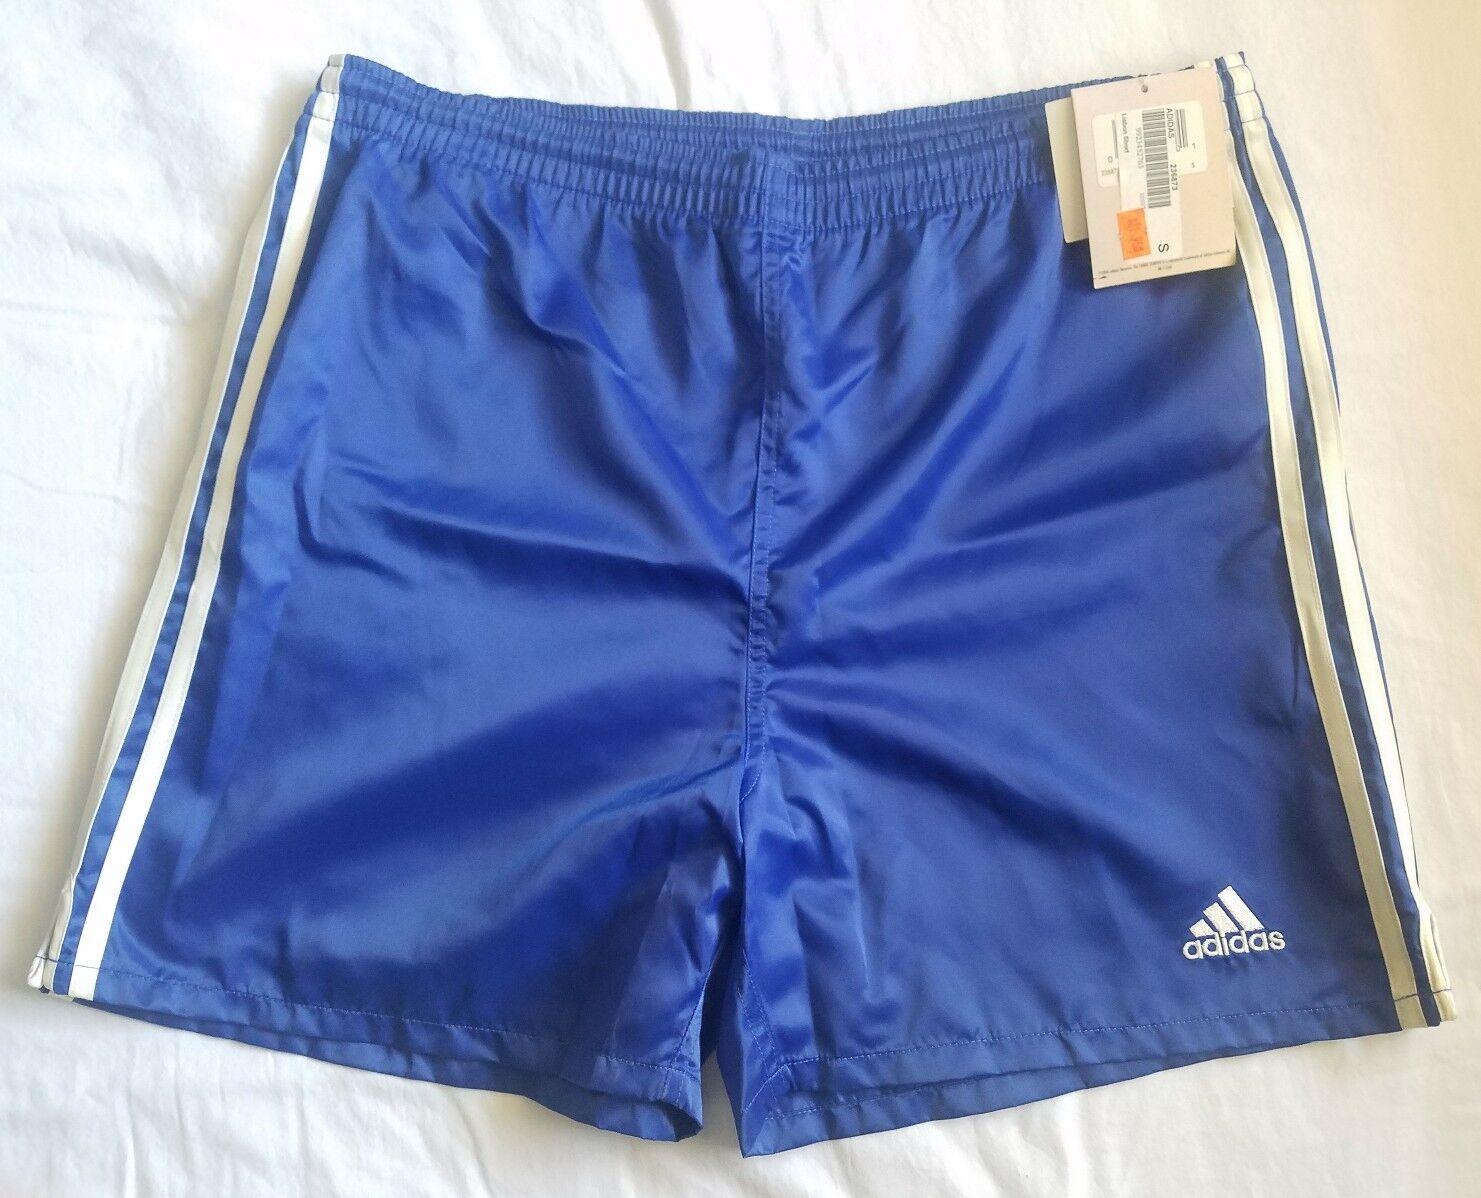 Vtg Adidas  Lisbon Glanz Nylon Shiny Satin Soccer Shorts New With Tags Small  cheapest